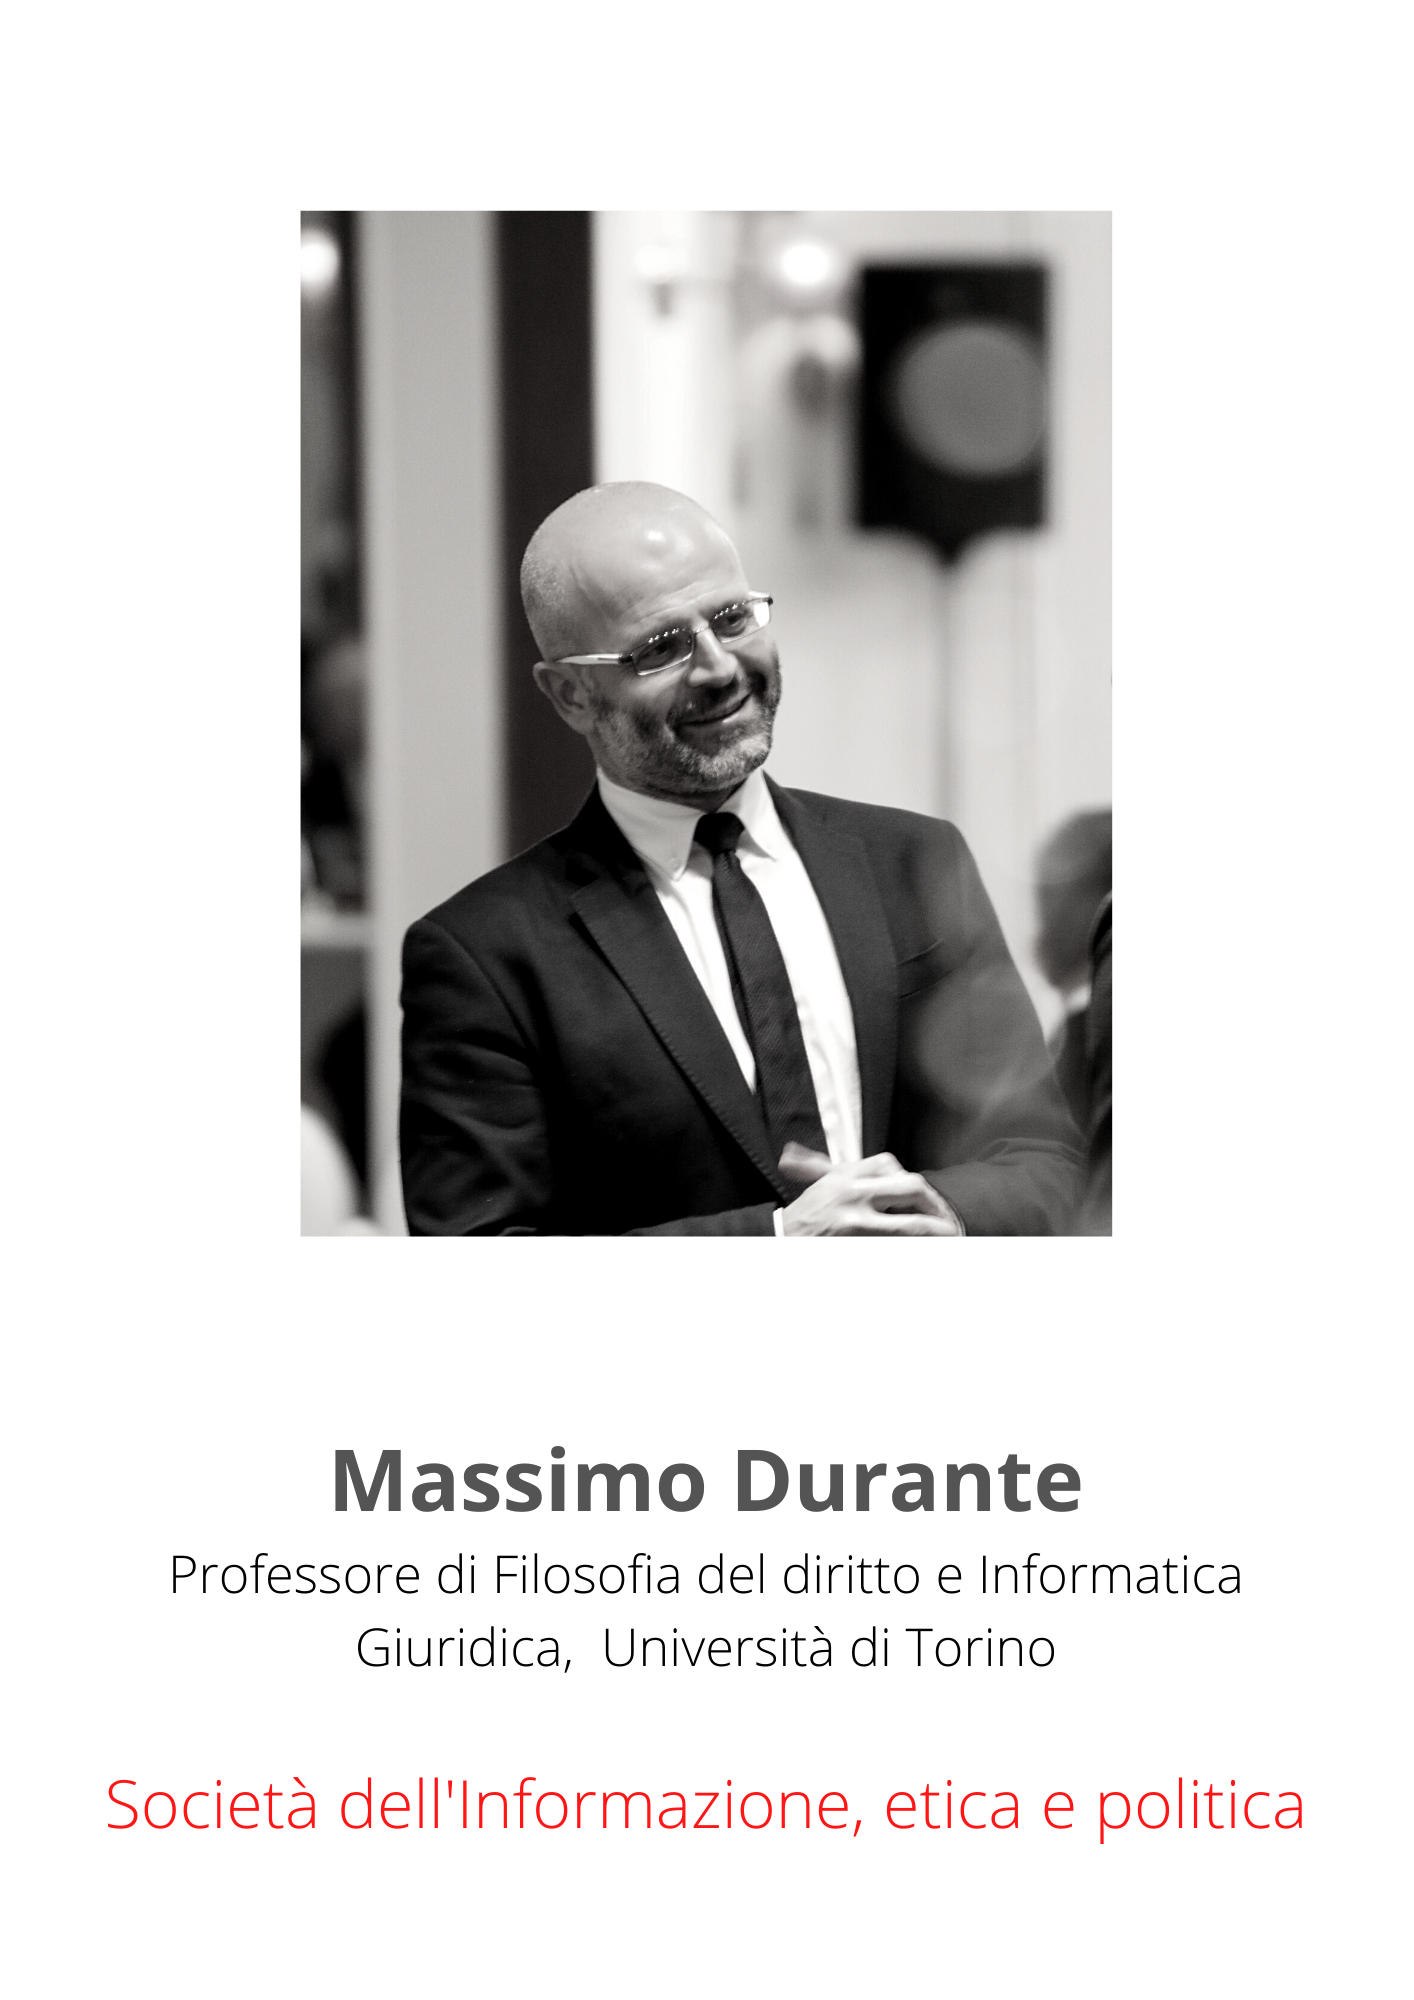 Massimo Durante